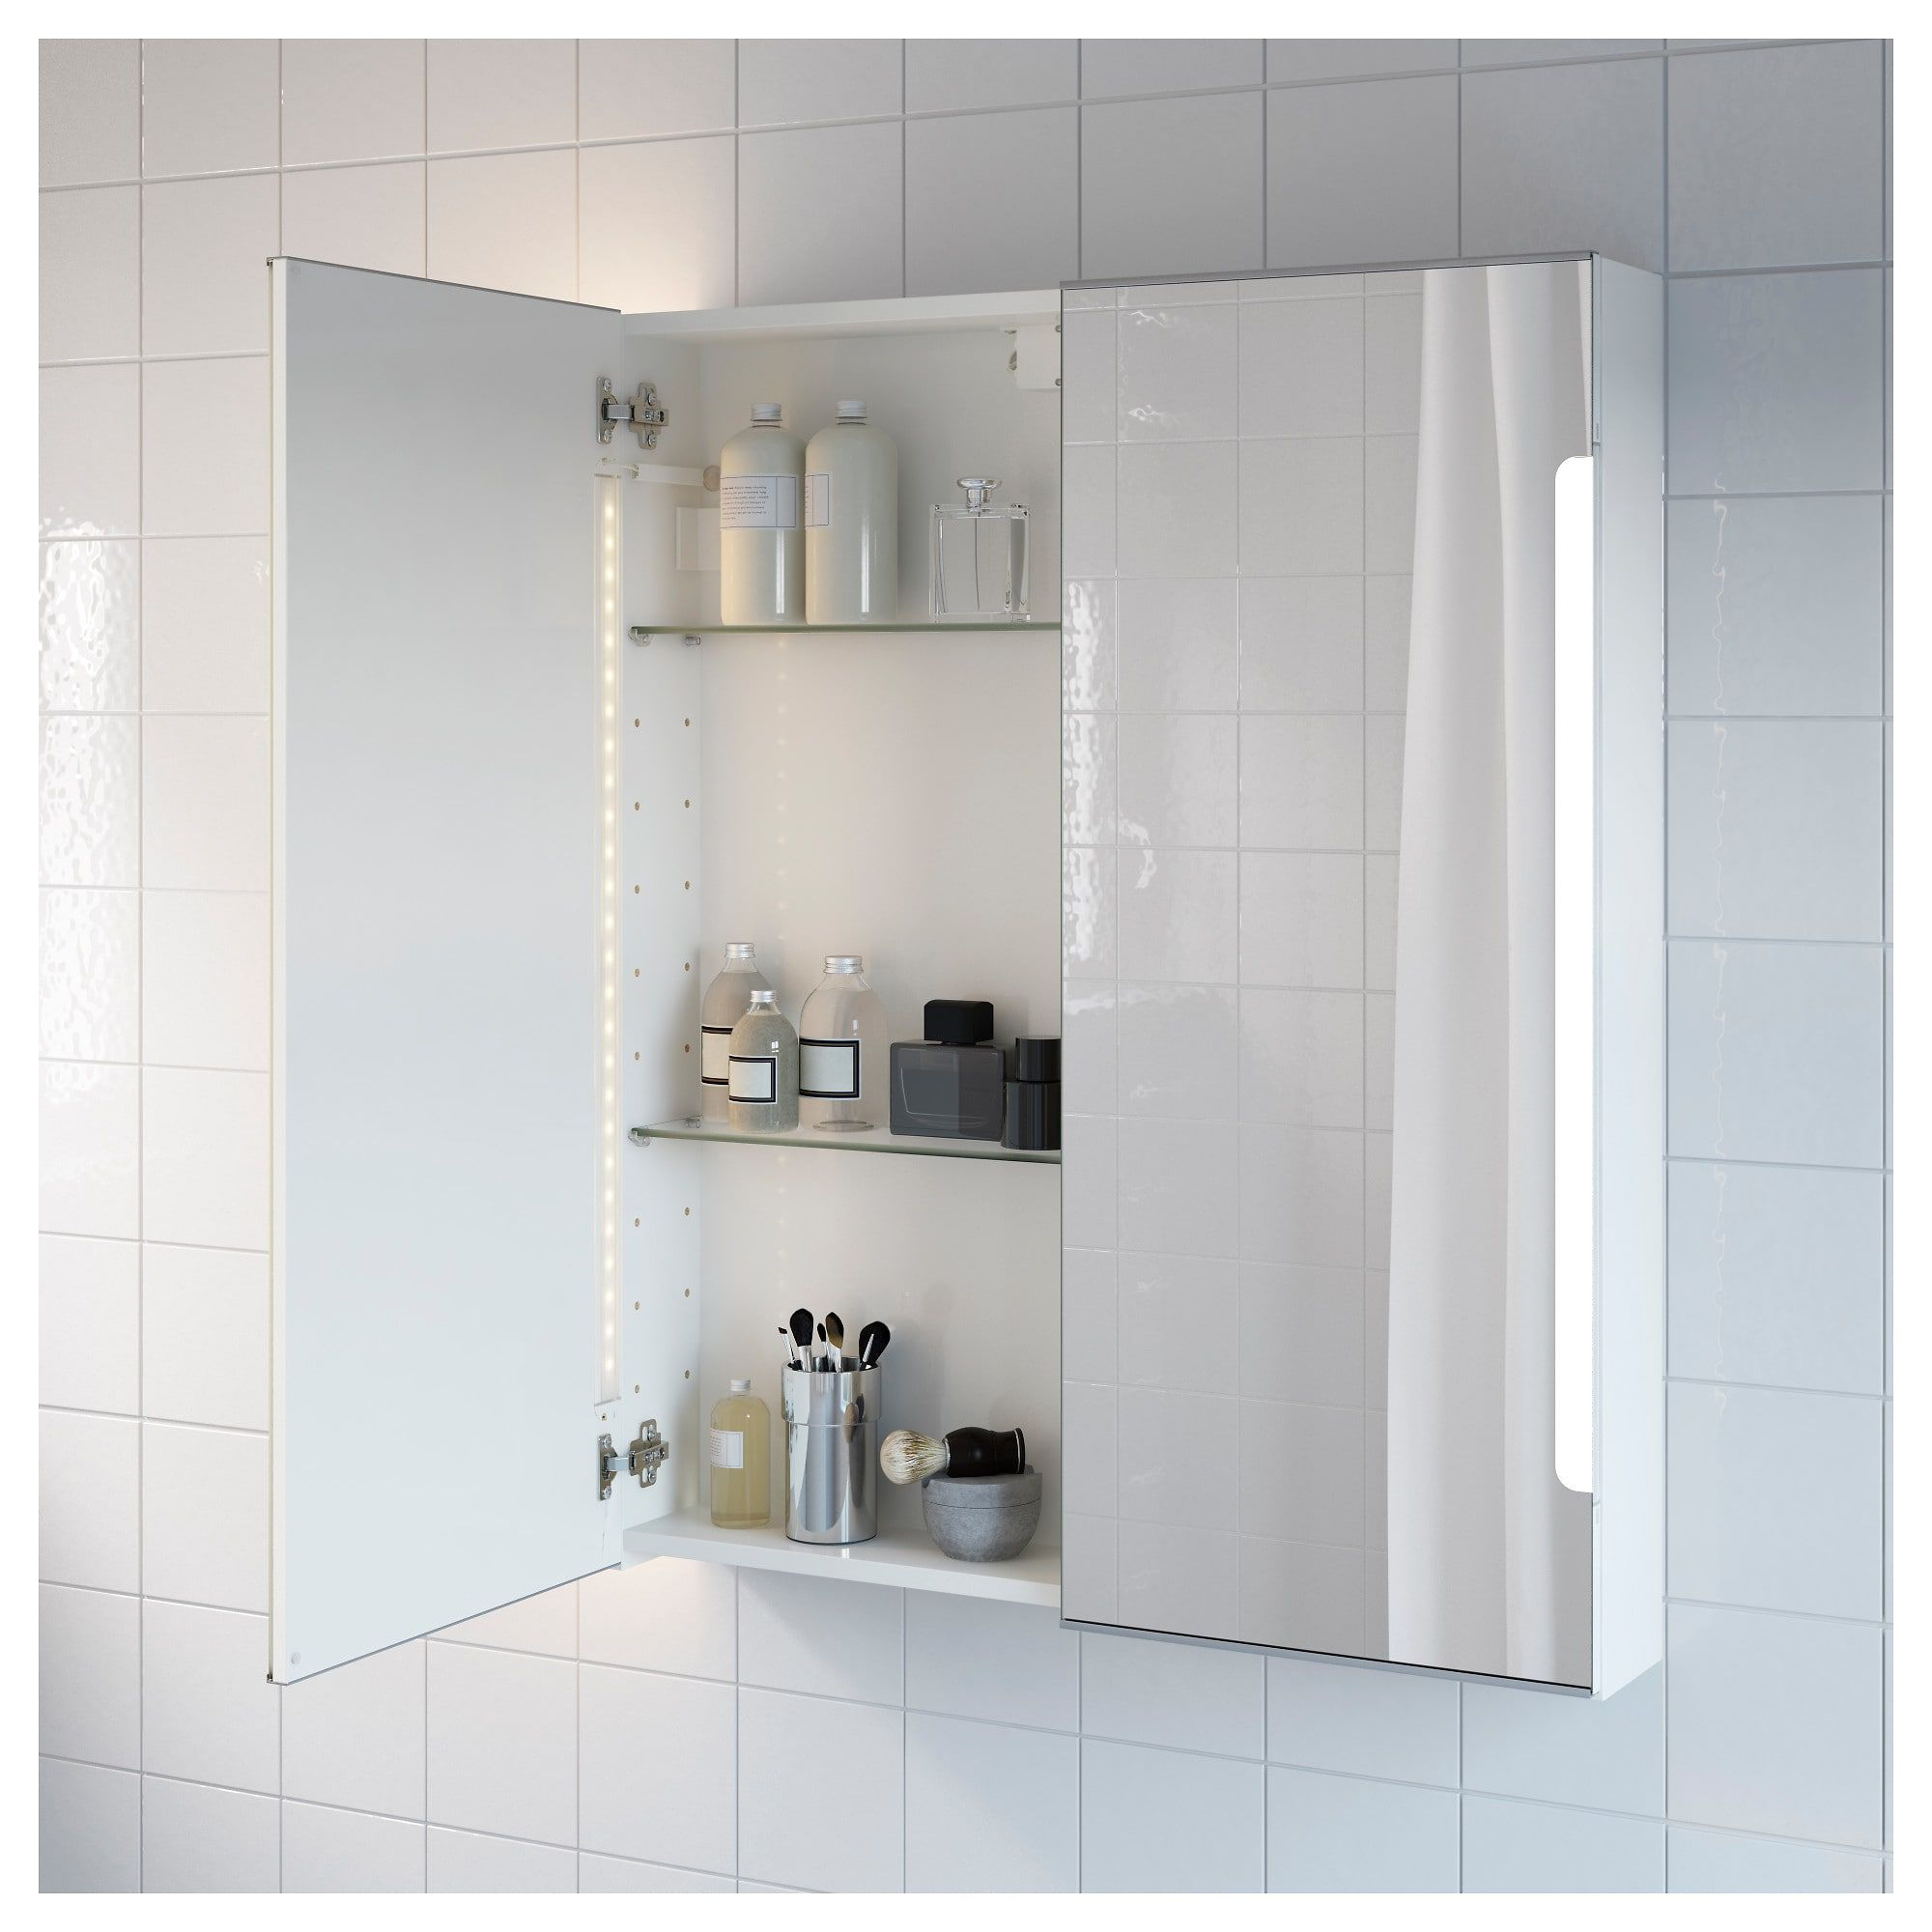 Storjorm Mirror Cabinet W 2 Doors Light White 31 1 2x5 1 2x37